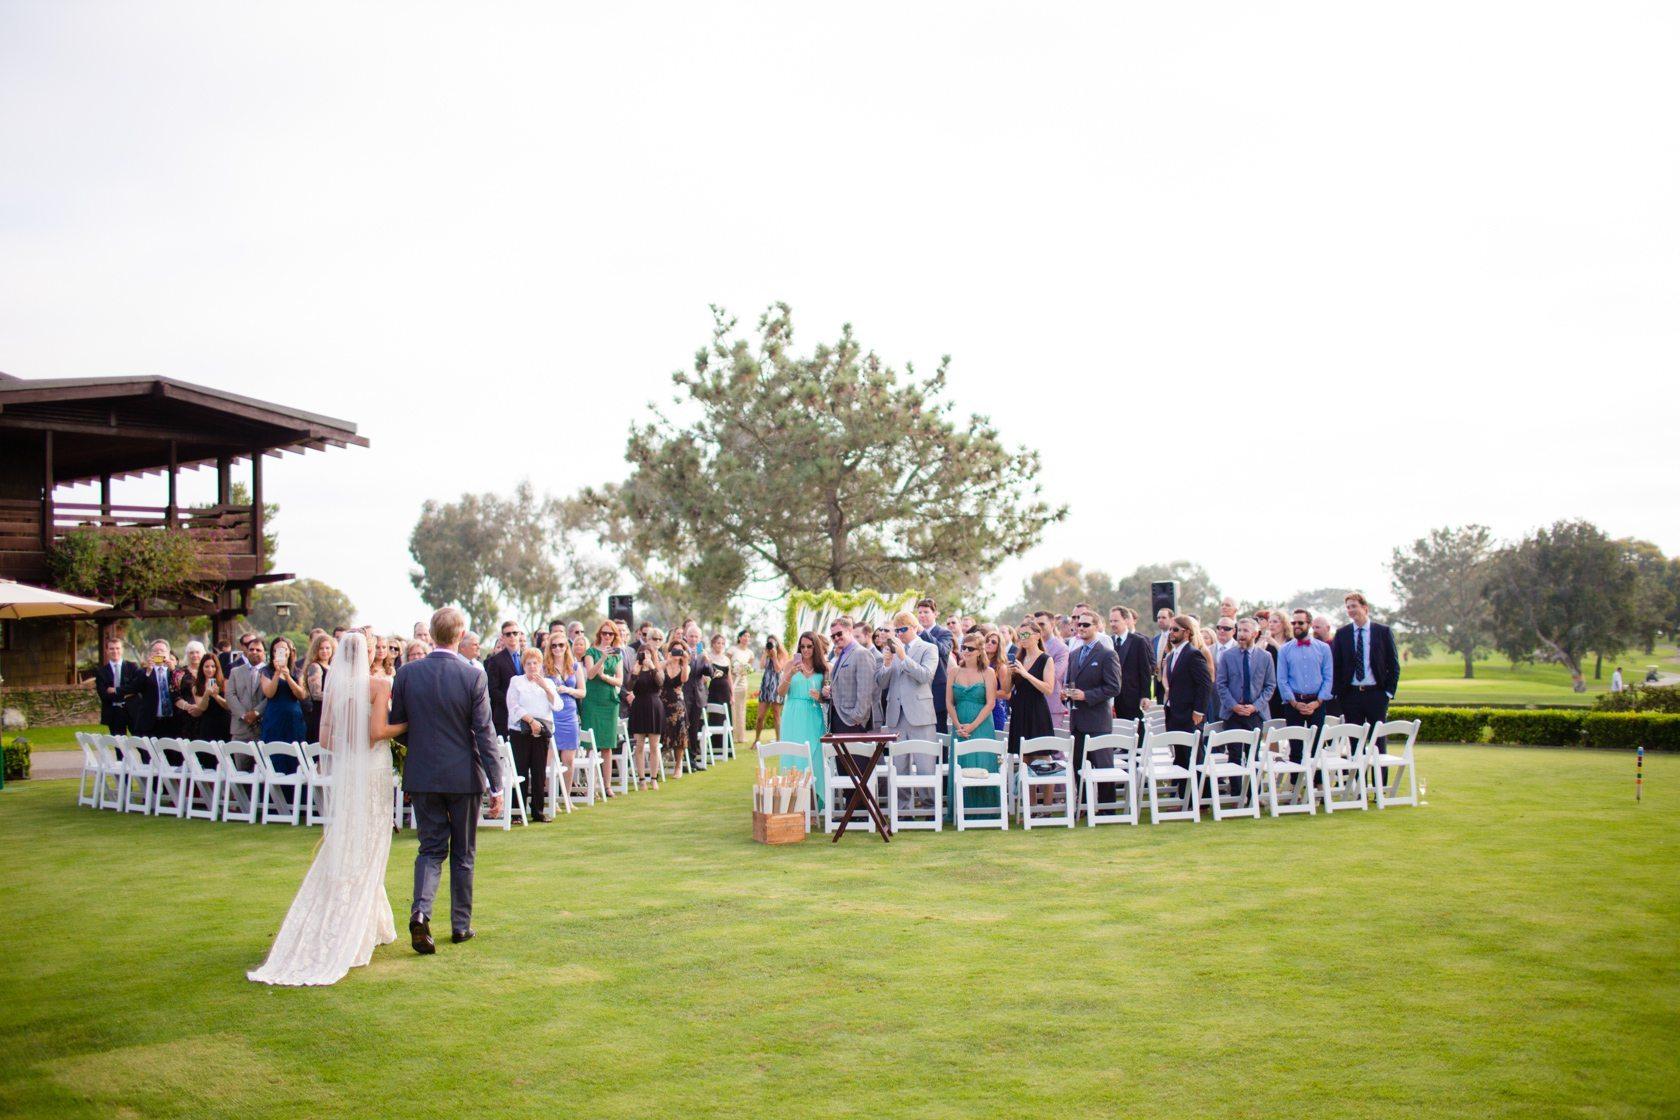 The_Lodge_at_Torrey_Pines_Wedding_044.jpg